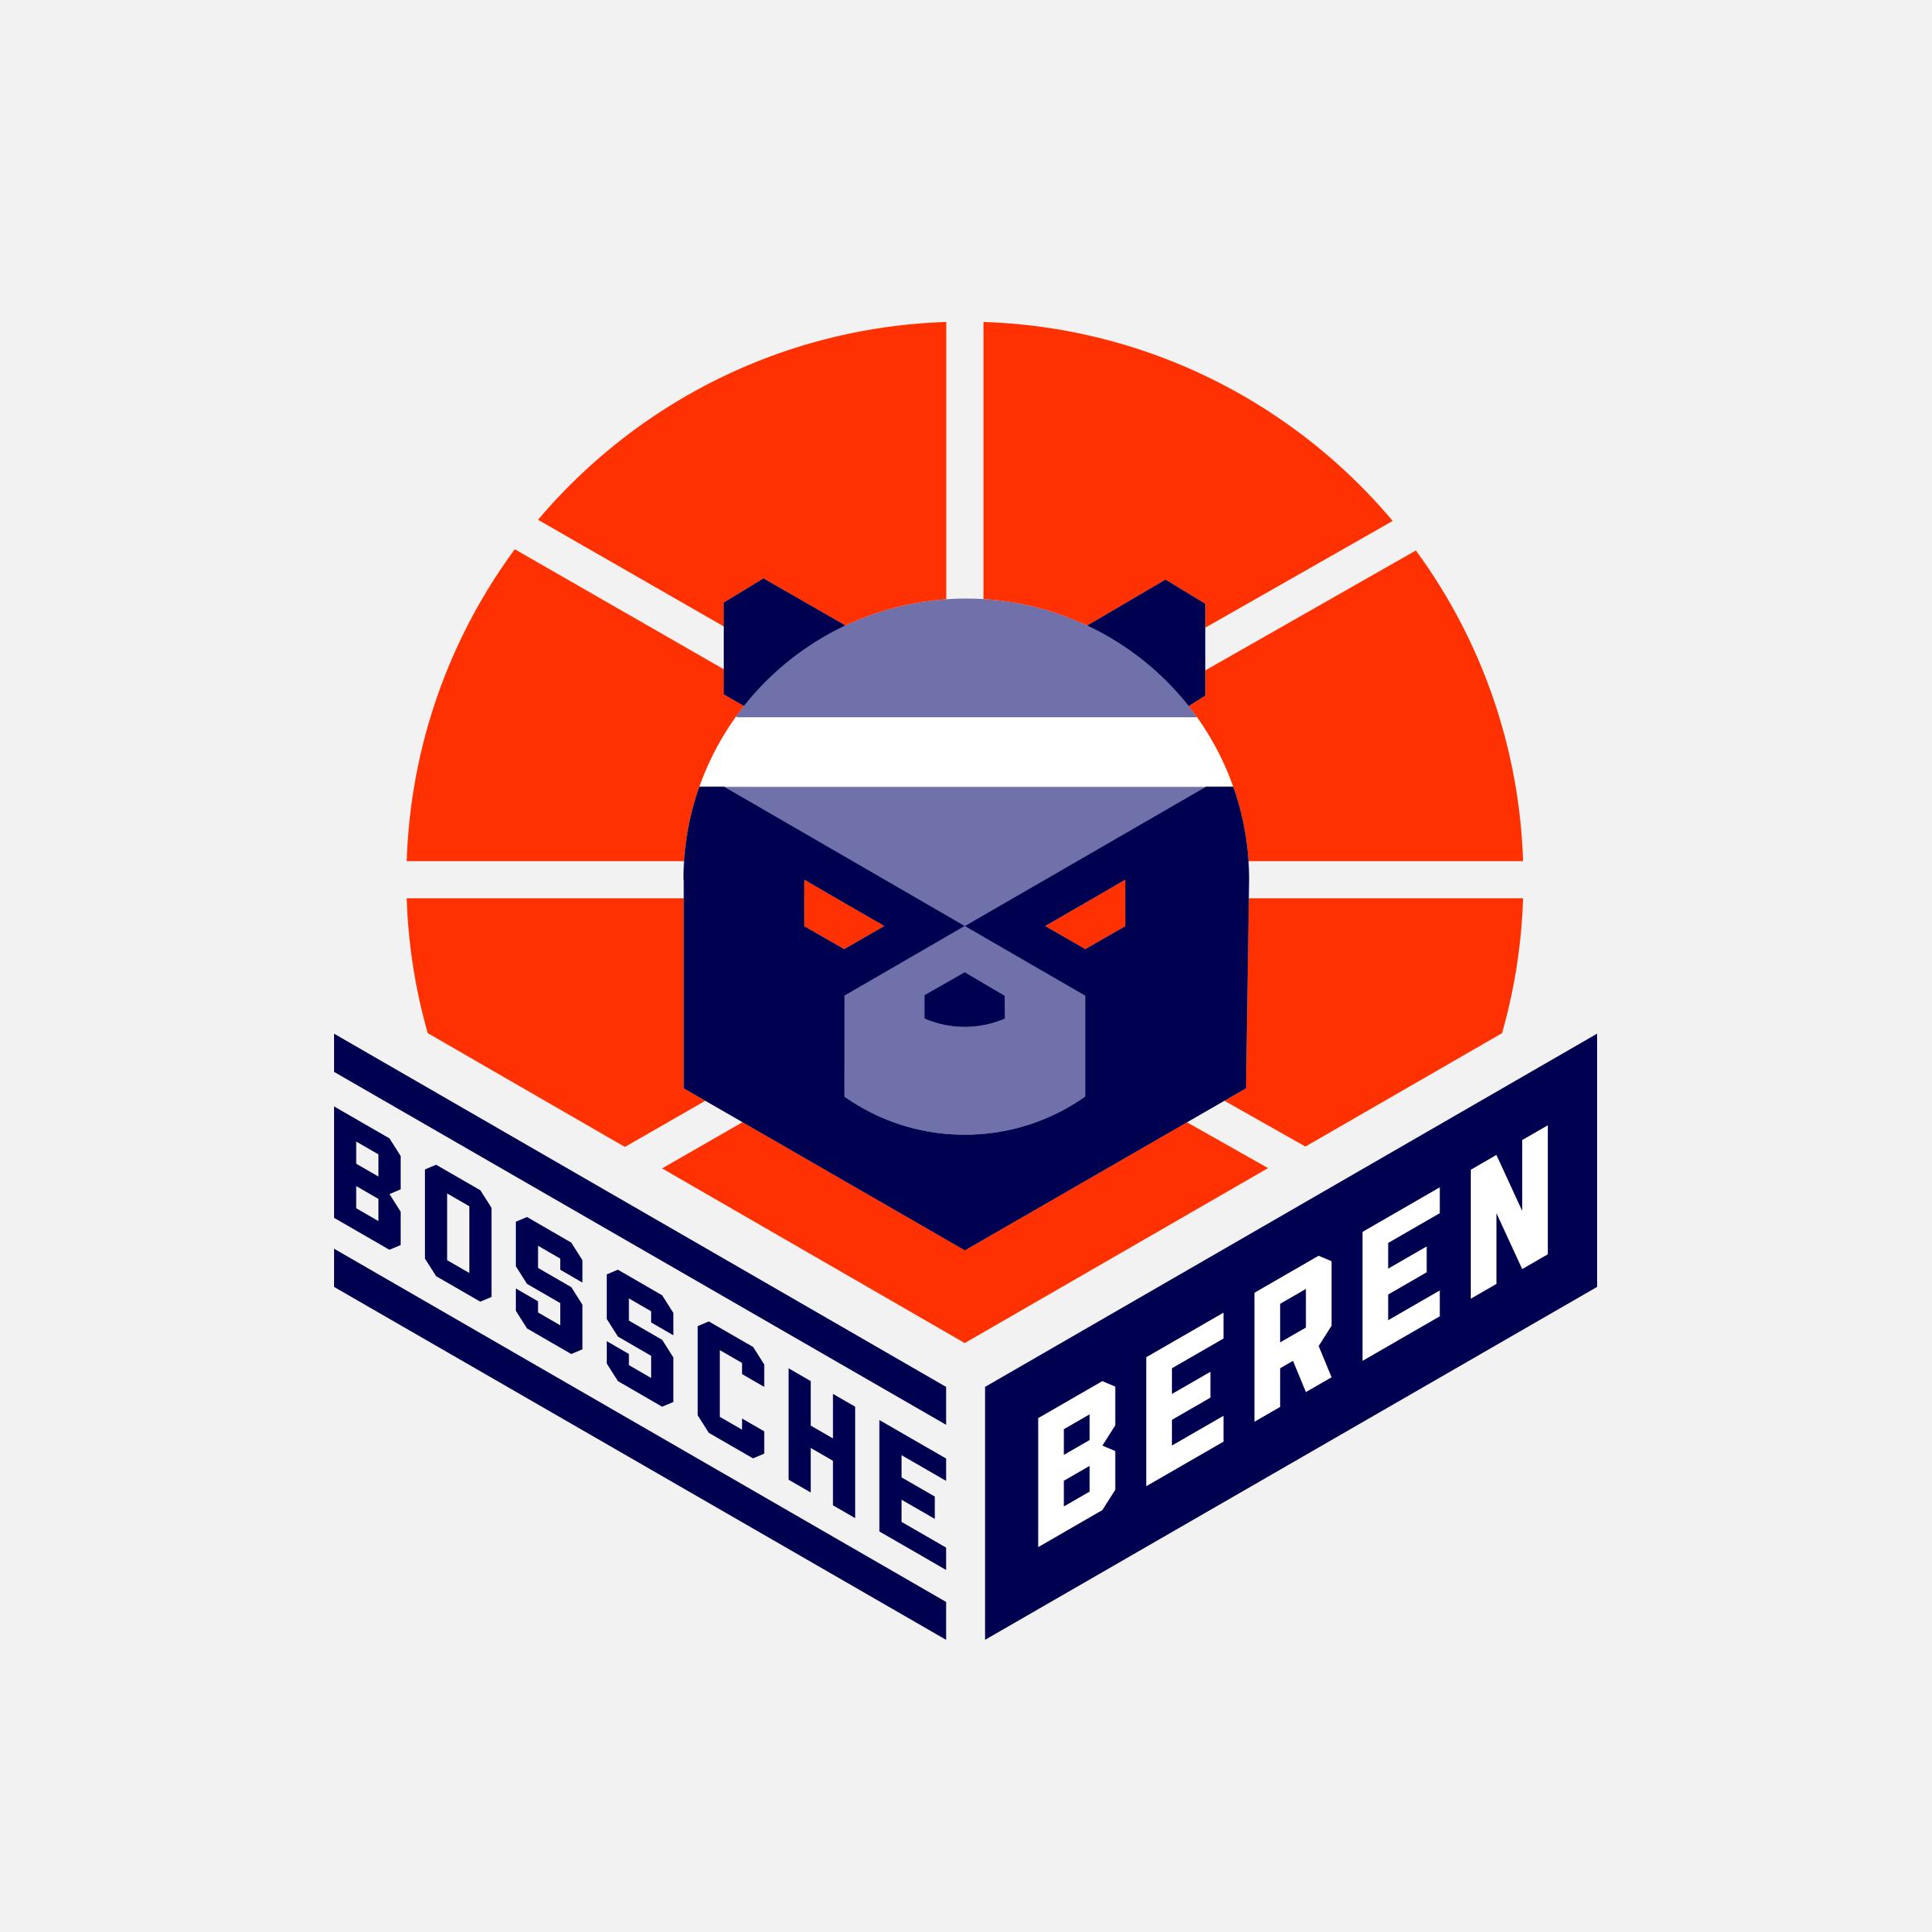 Bossche Beren